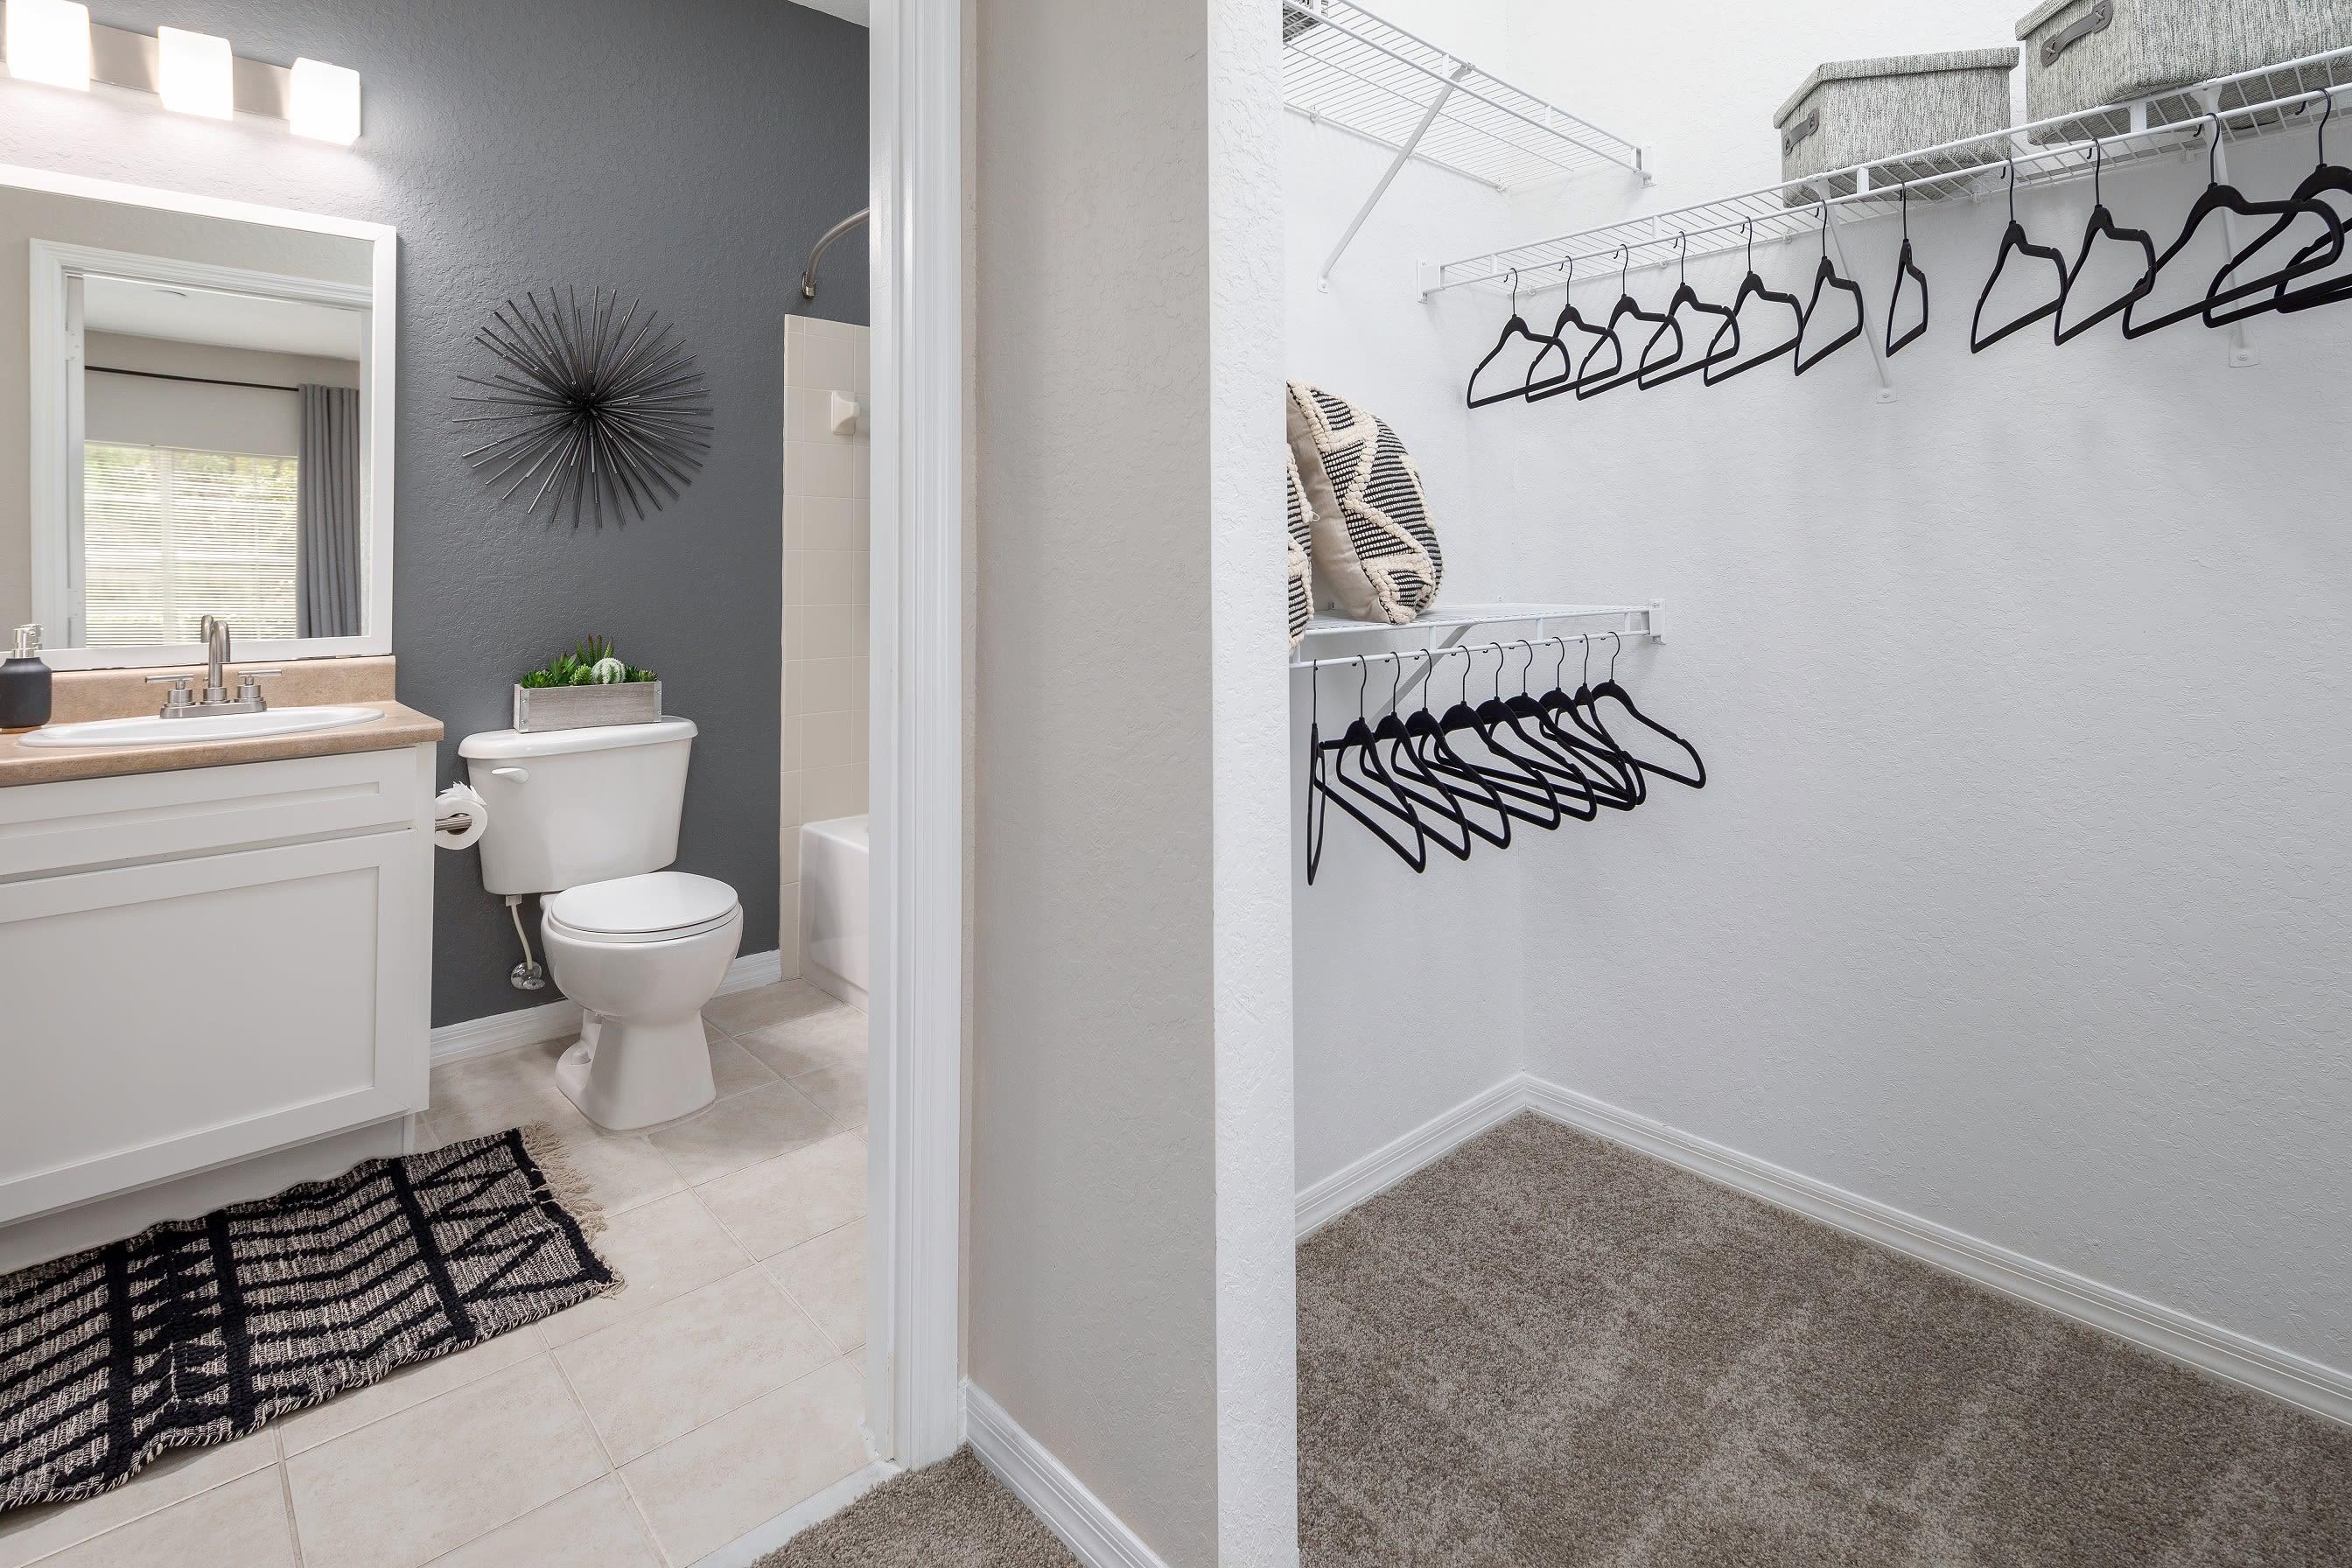 Walk in closet adjacent to main bathroom at Mezza in Jacksonville, Florida